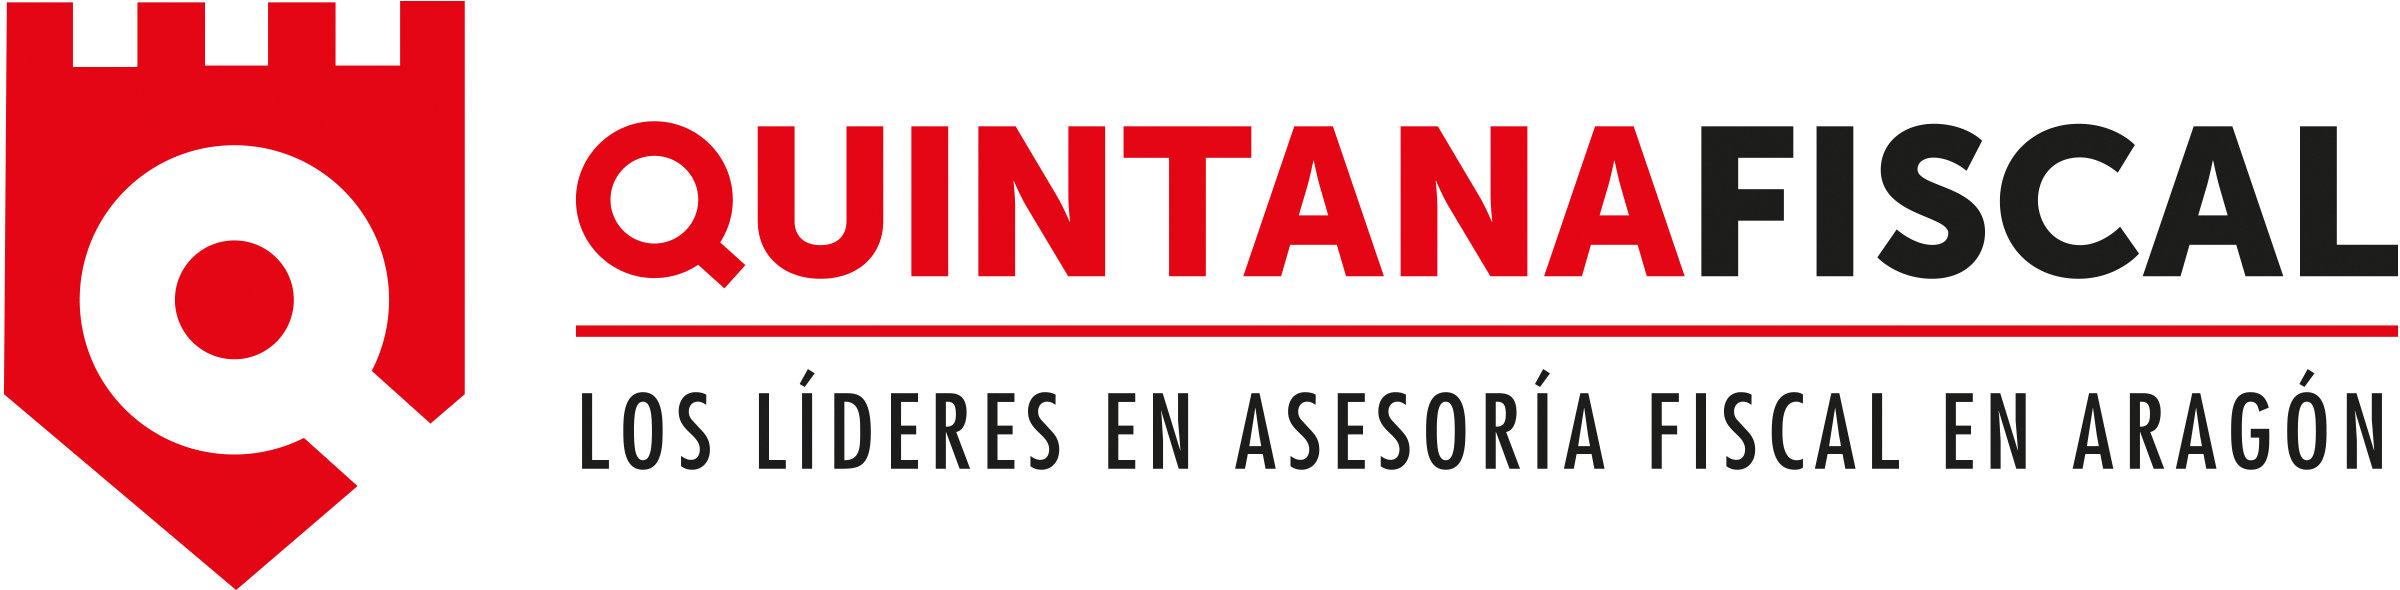 QUINTANA Fiscal. Logo Marca Horizontal. Gran formato